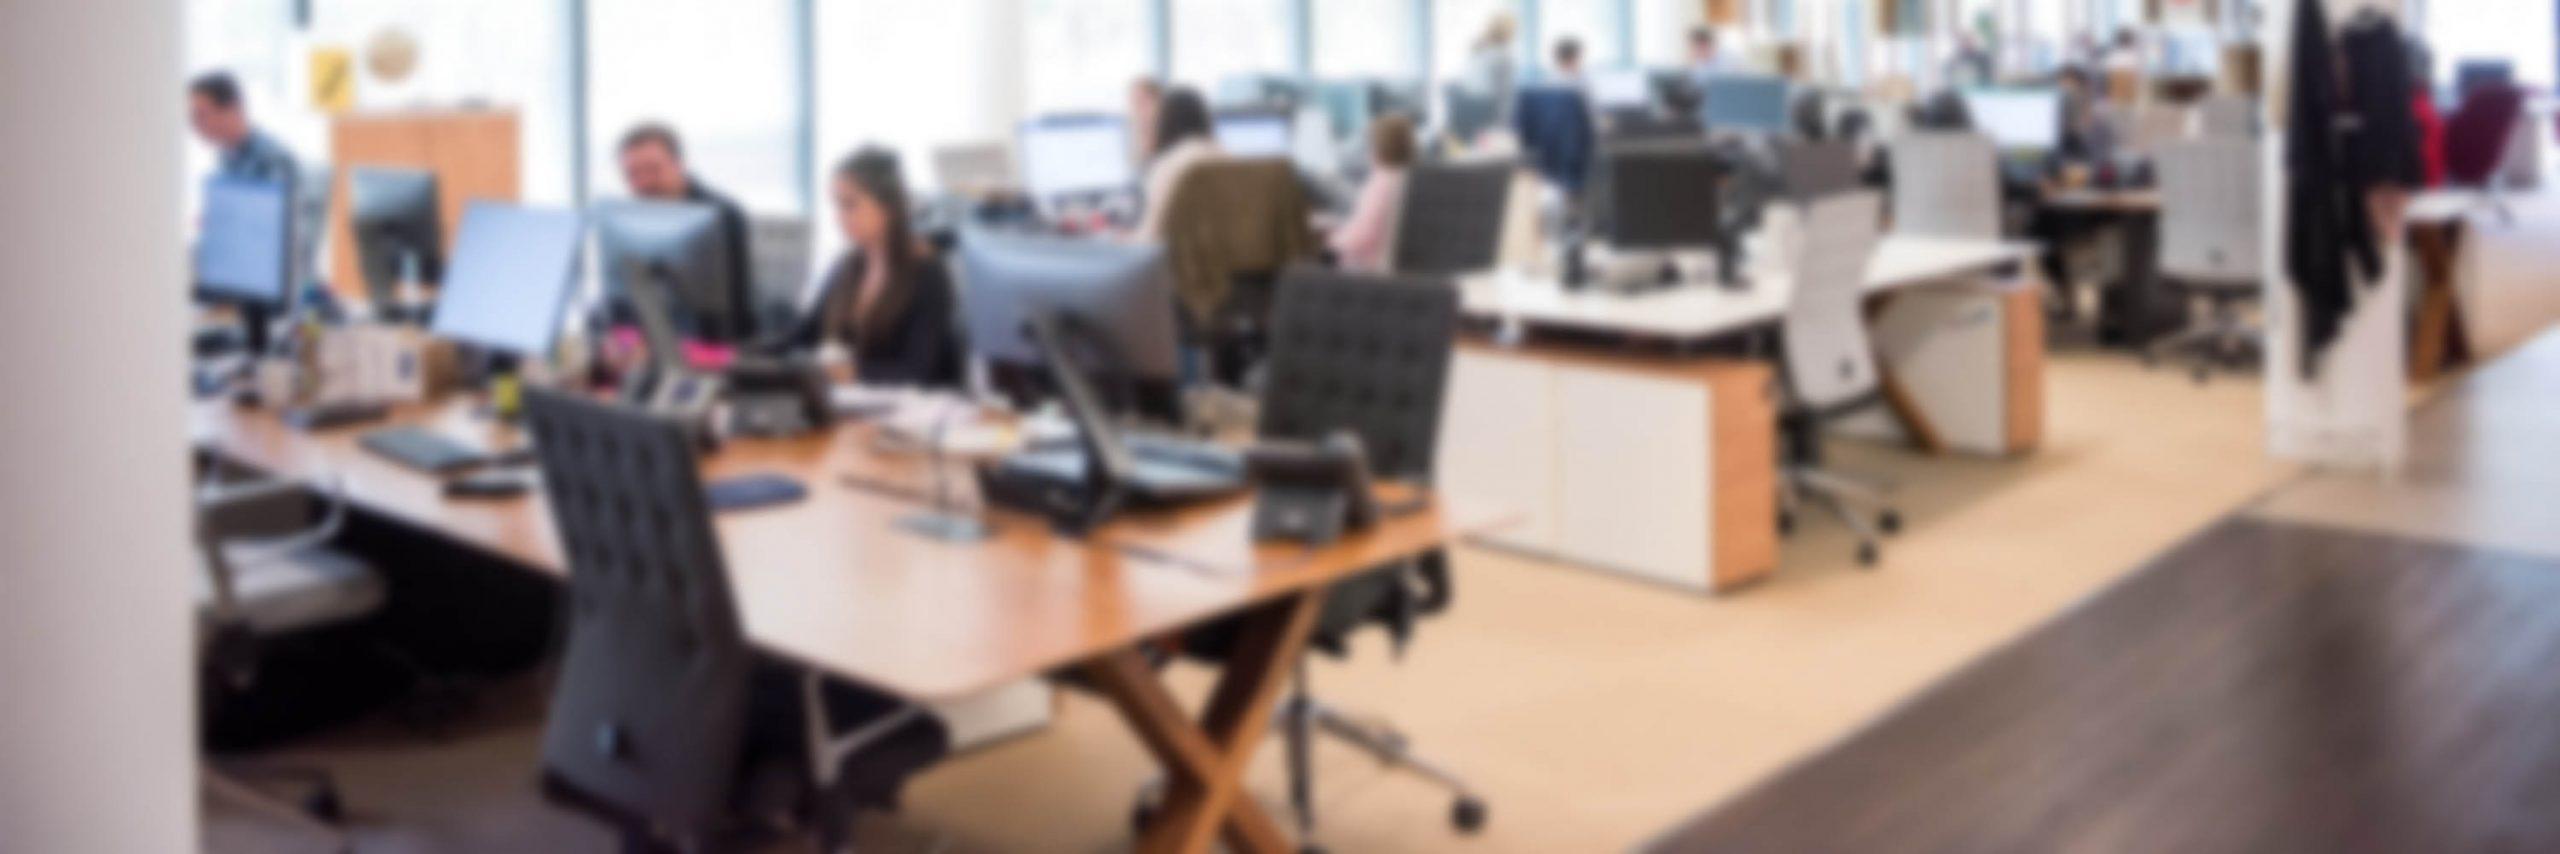 Twin Your Workplace Bin Twinning